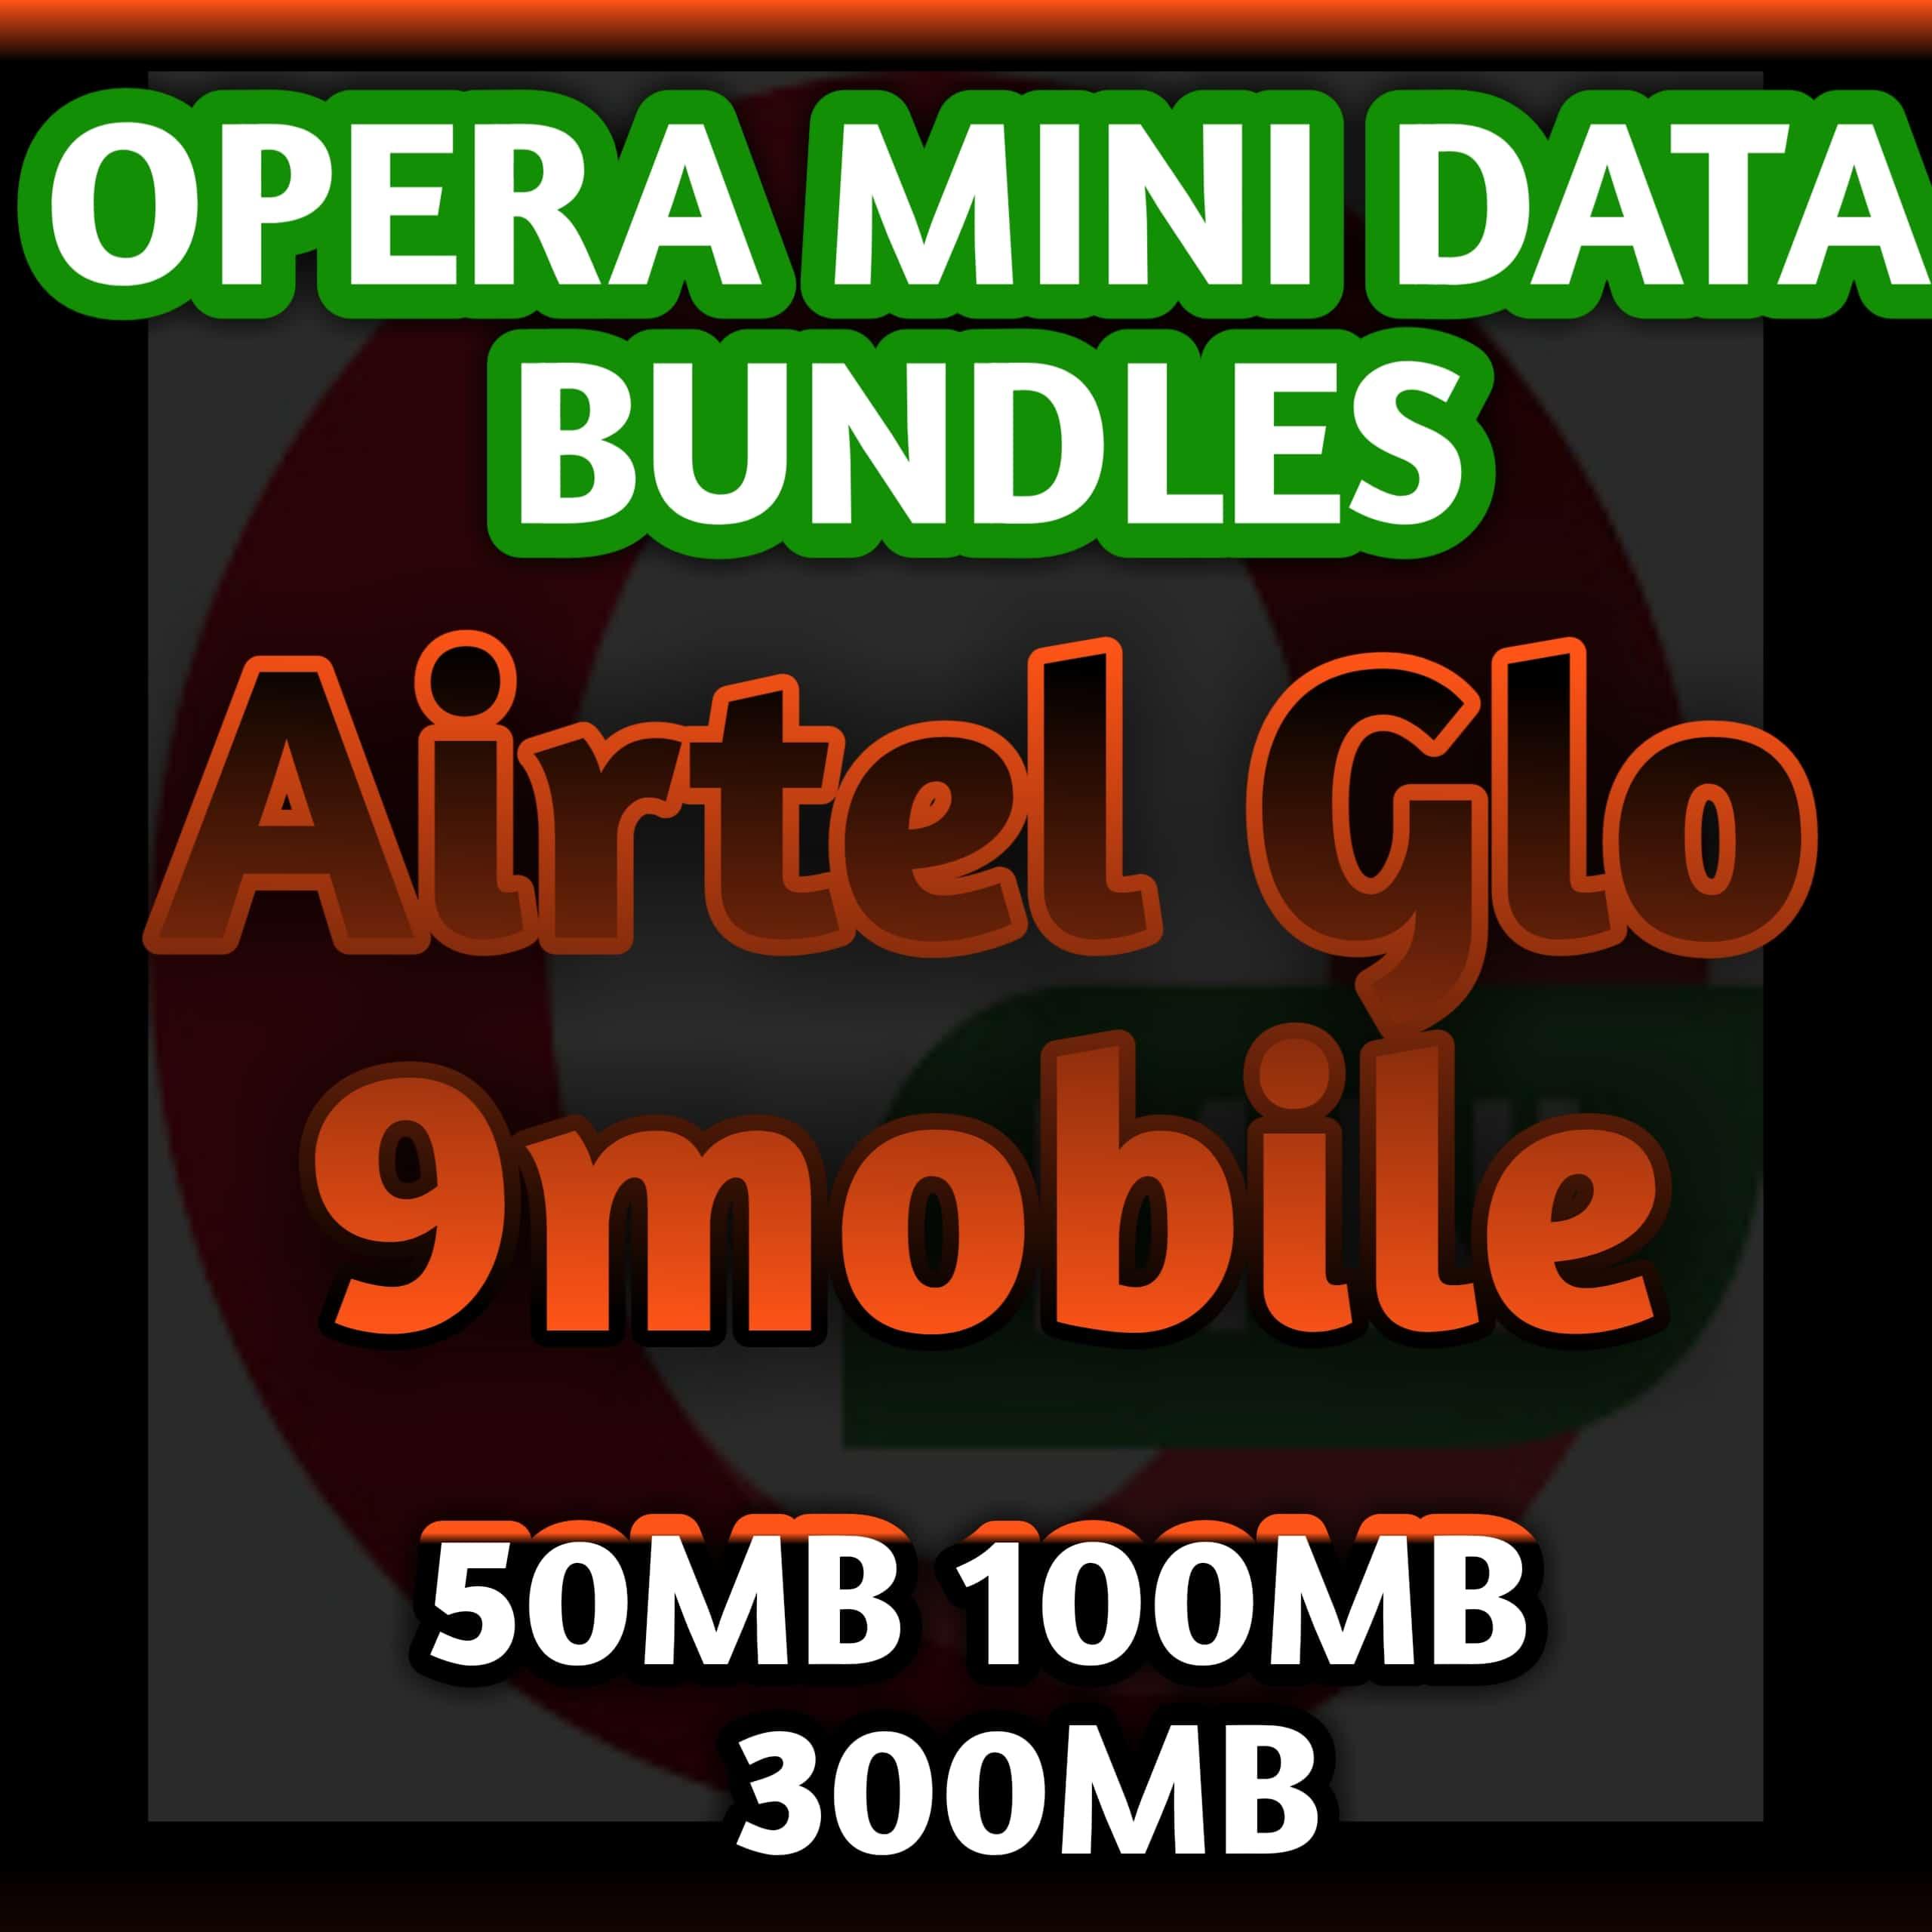 Opera data bundles